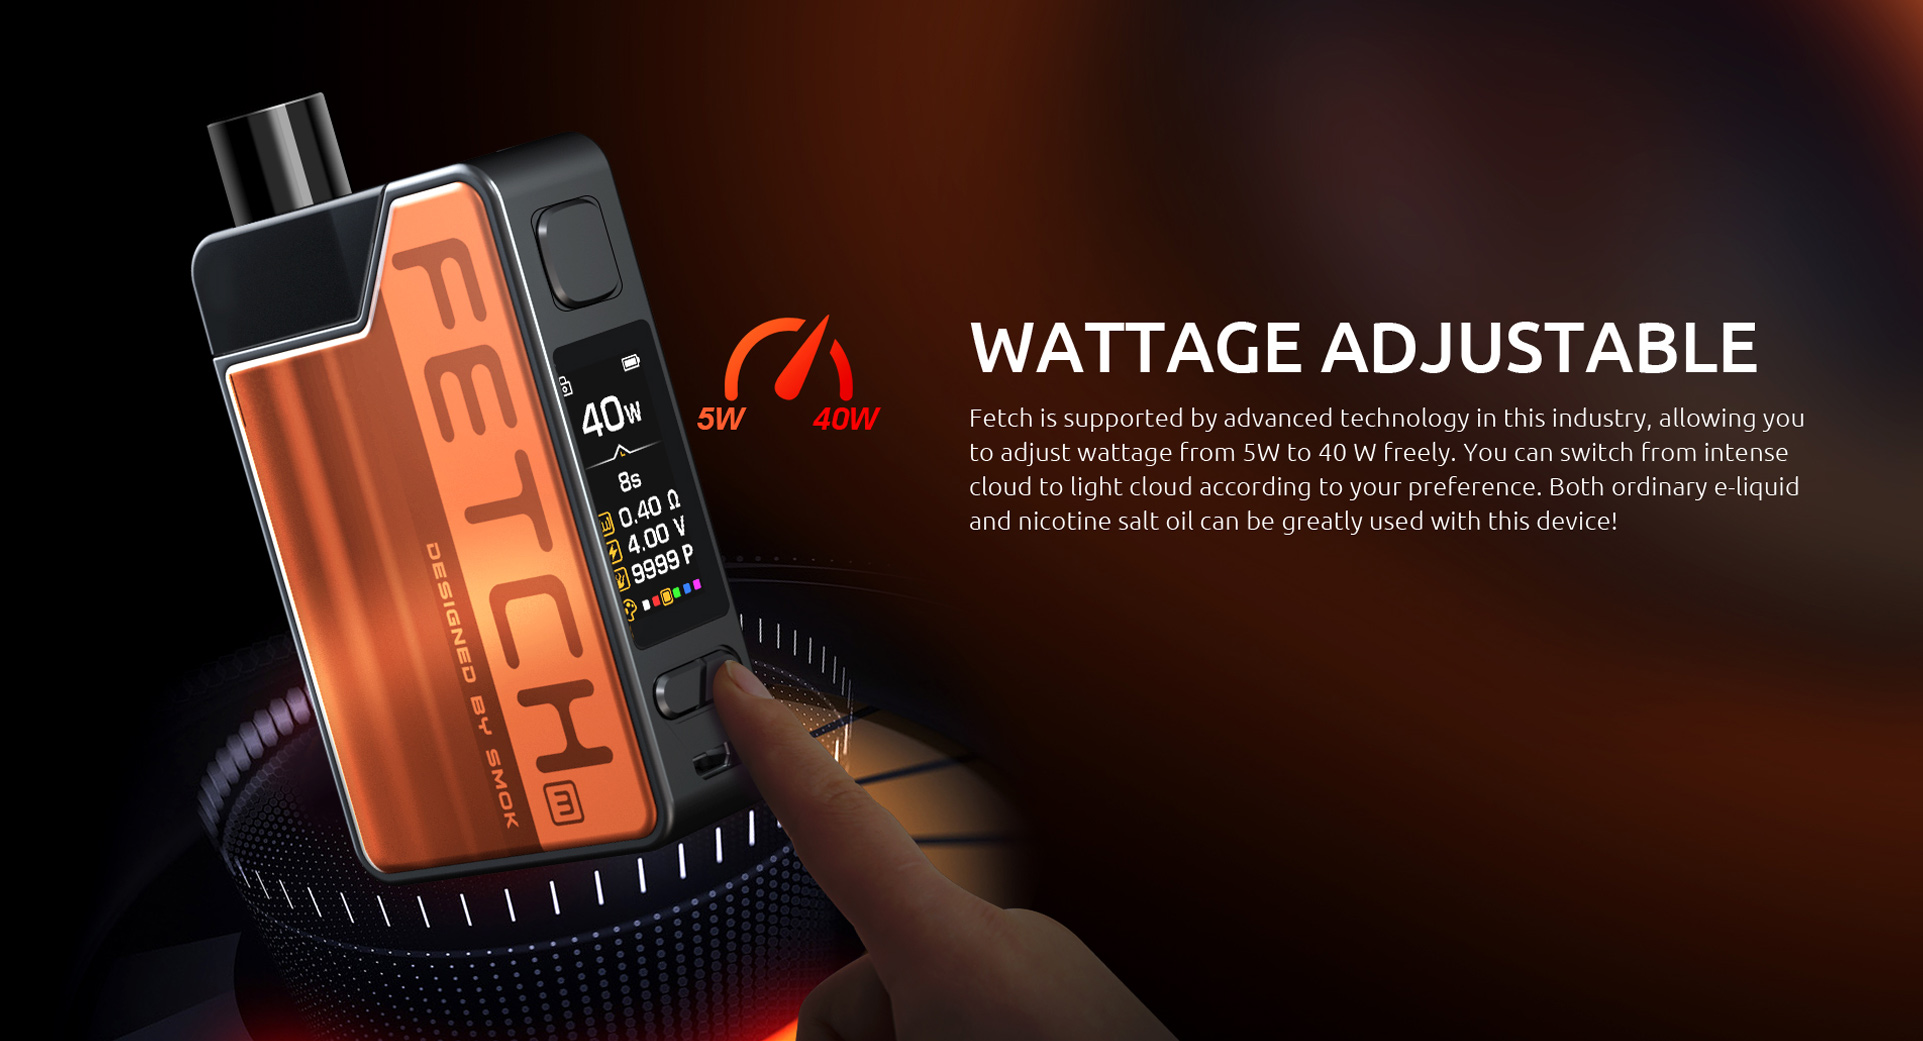 SMOK Fetch Mini is Wattage Adjustable